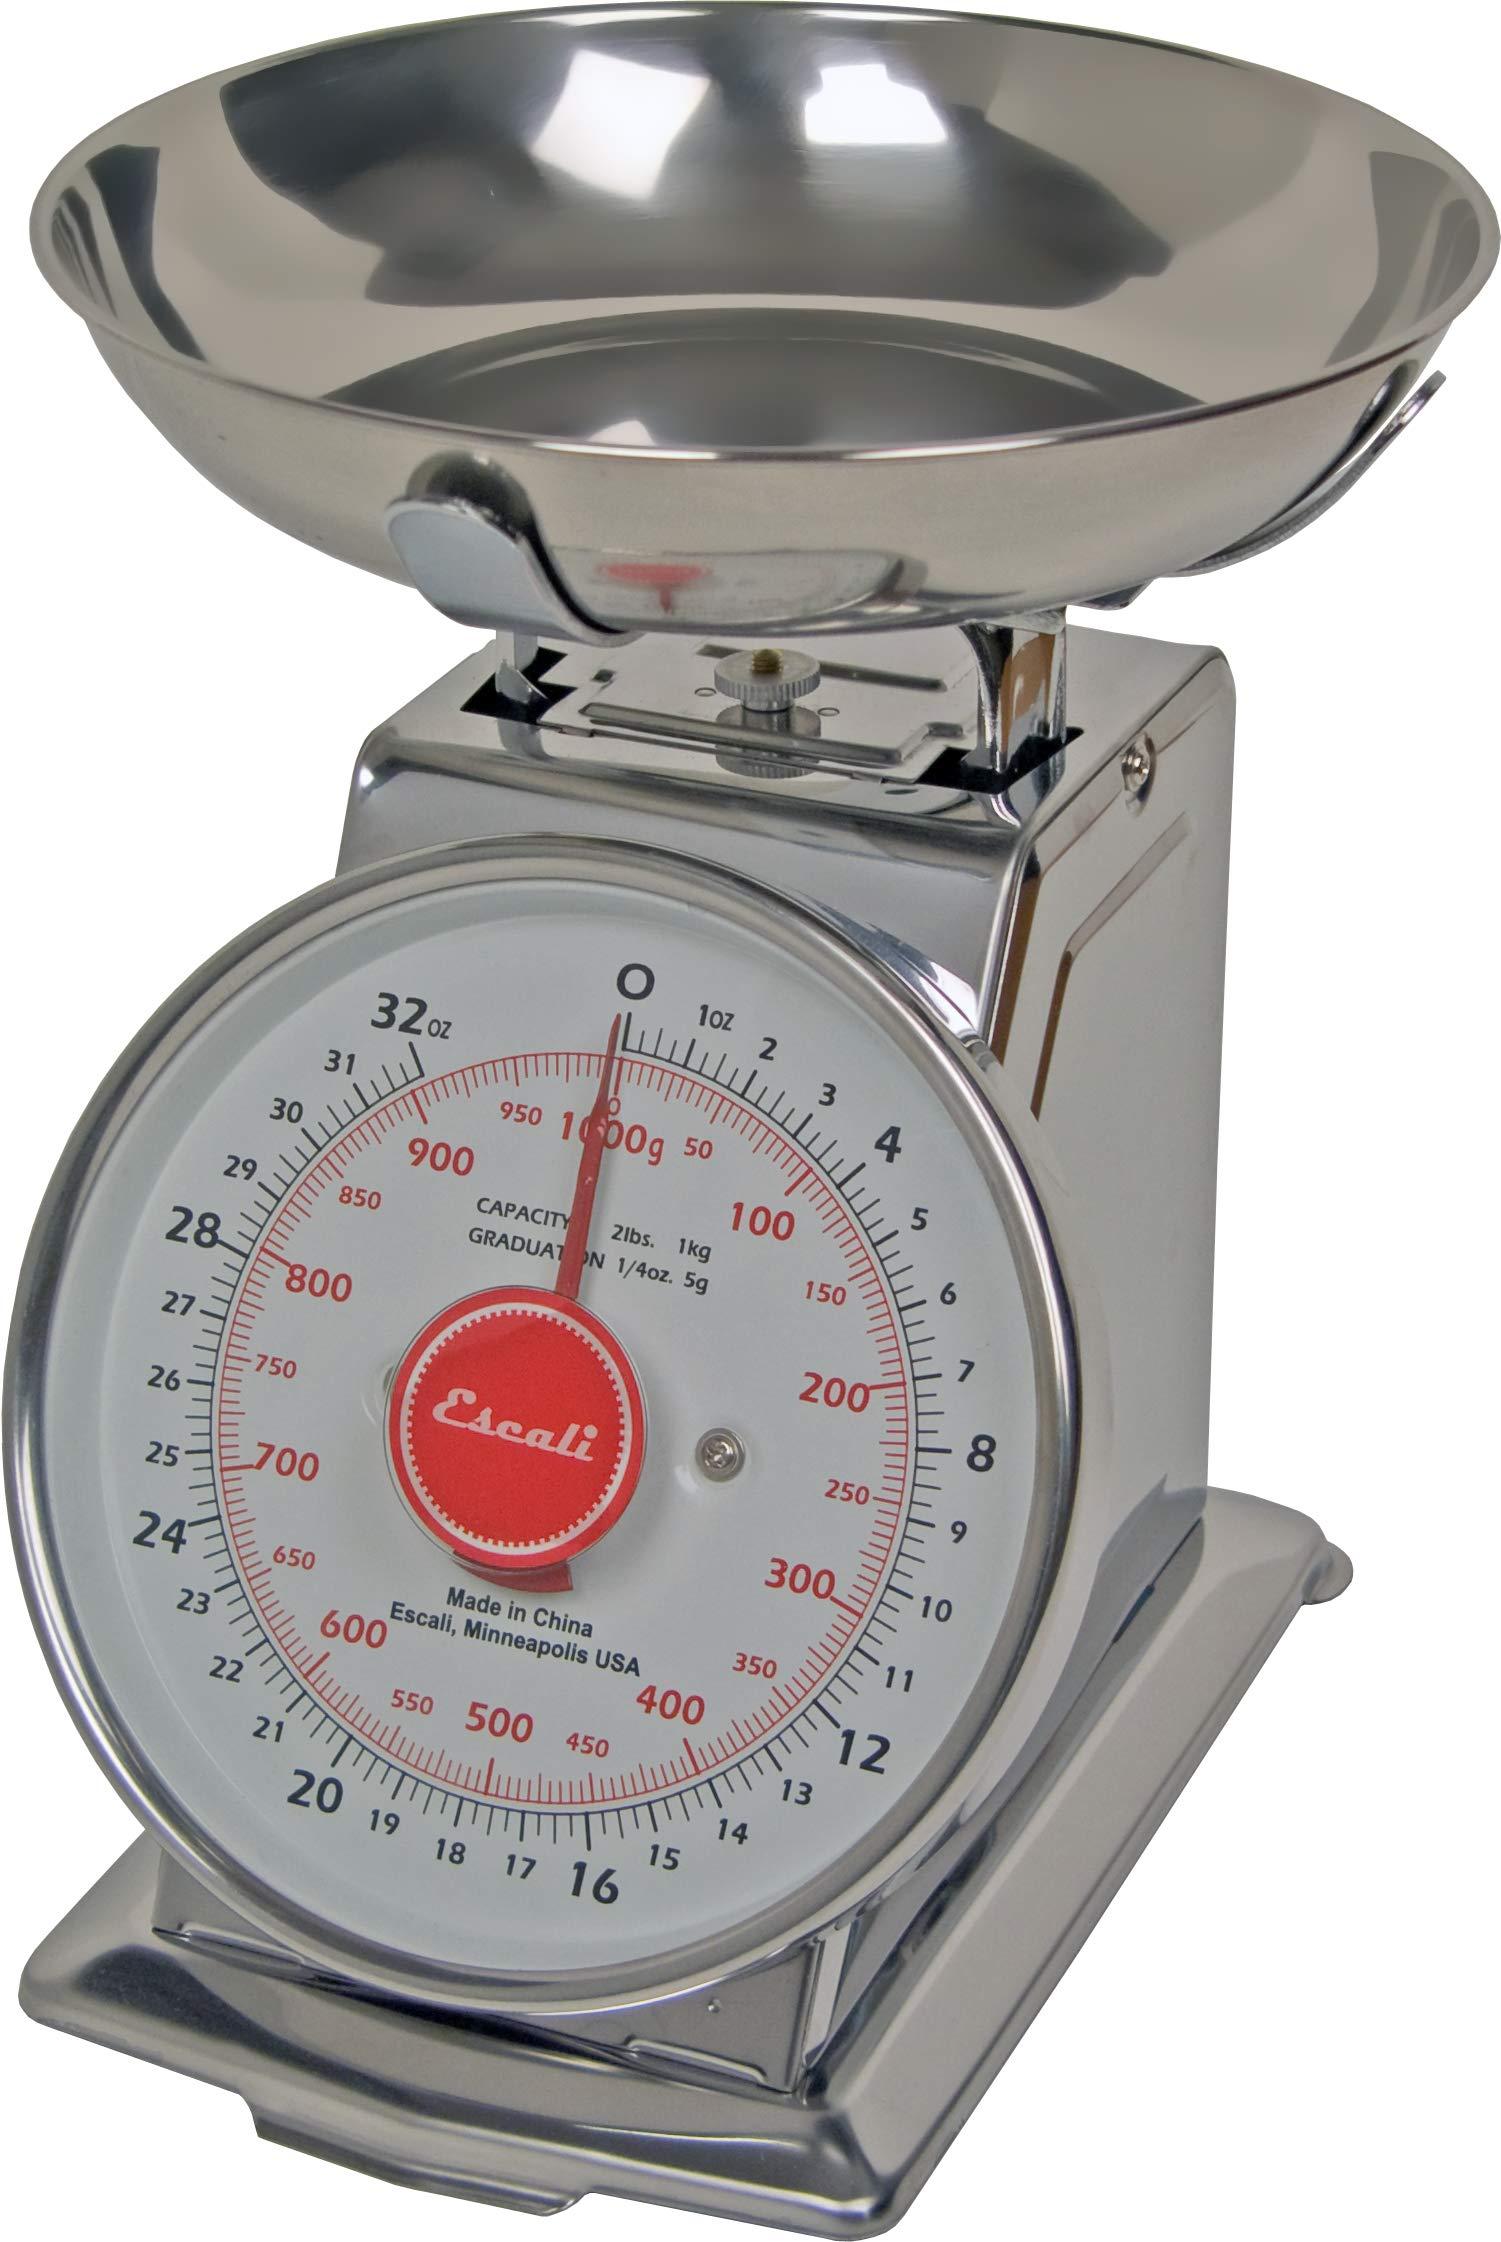 San Jamar SCDLB2 Mechanical Dial Scale, 2 Pound Capacity by San Jamar